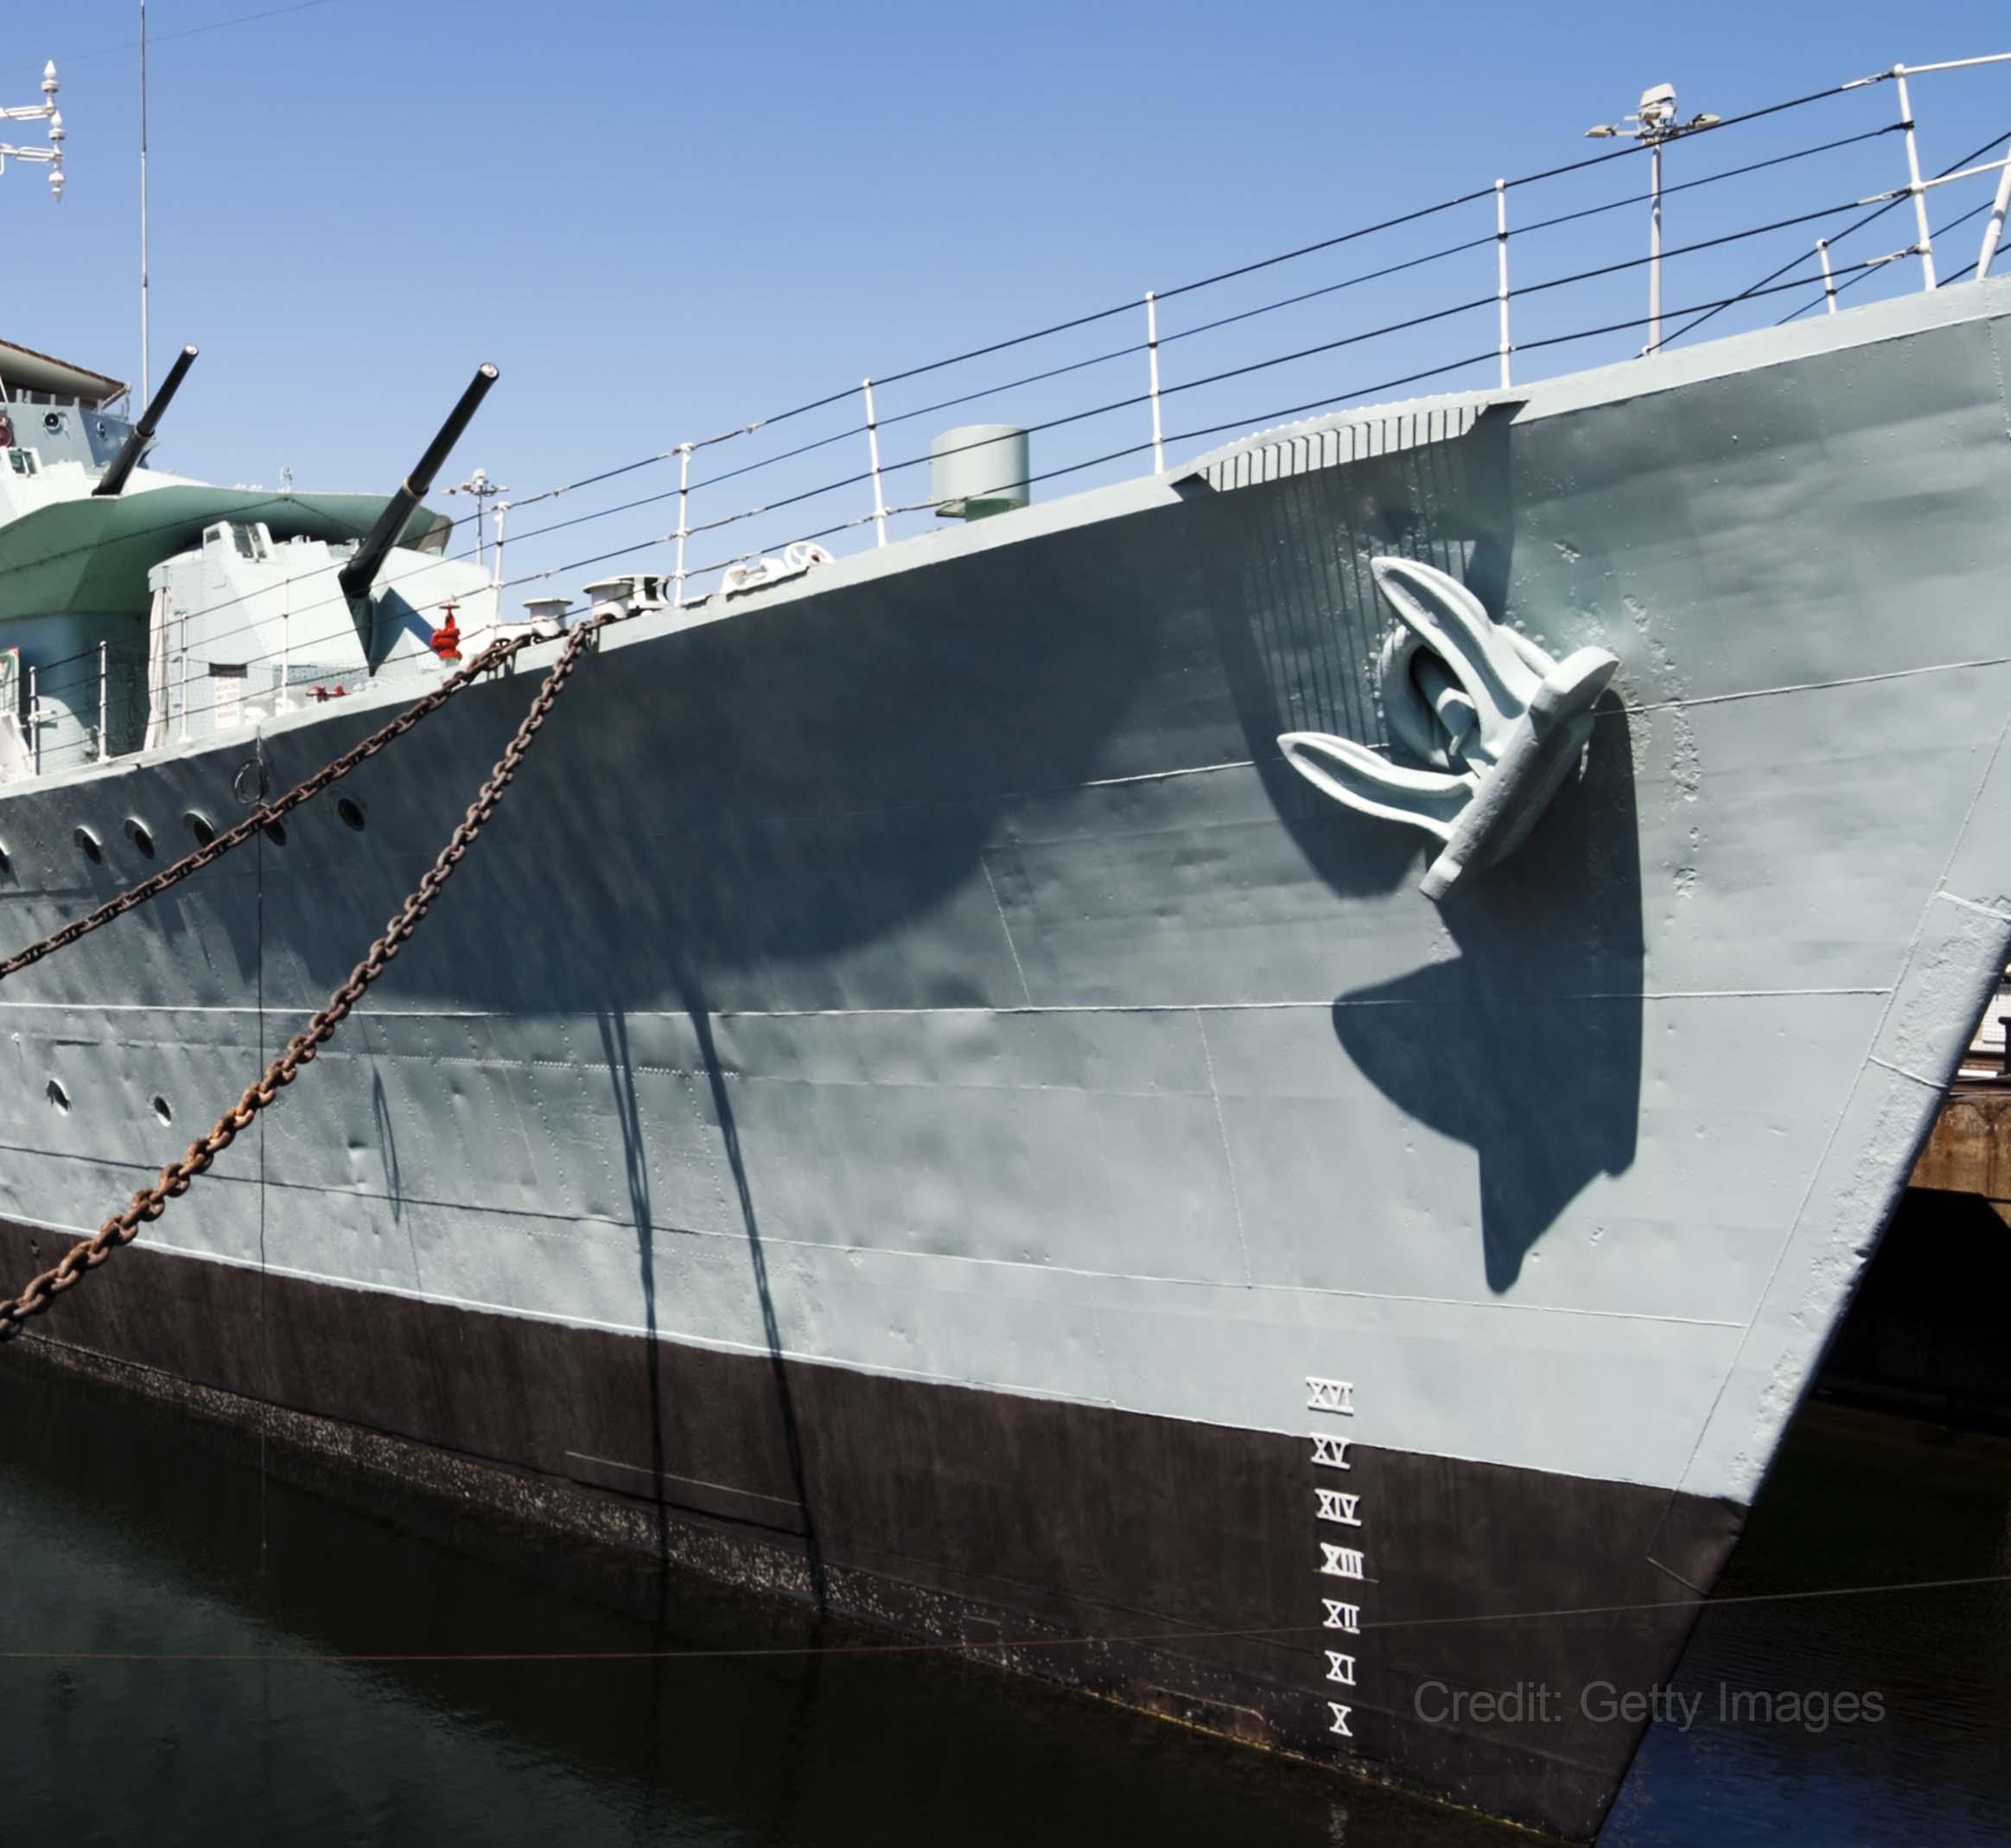 Historic warship undergoes major refit courtesy of Sykes Pumps